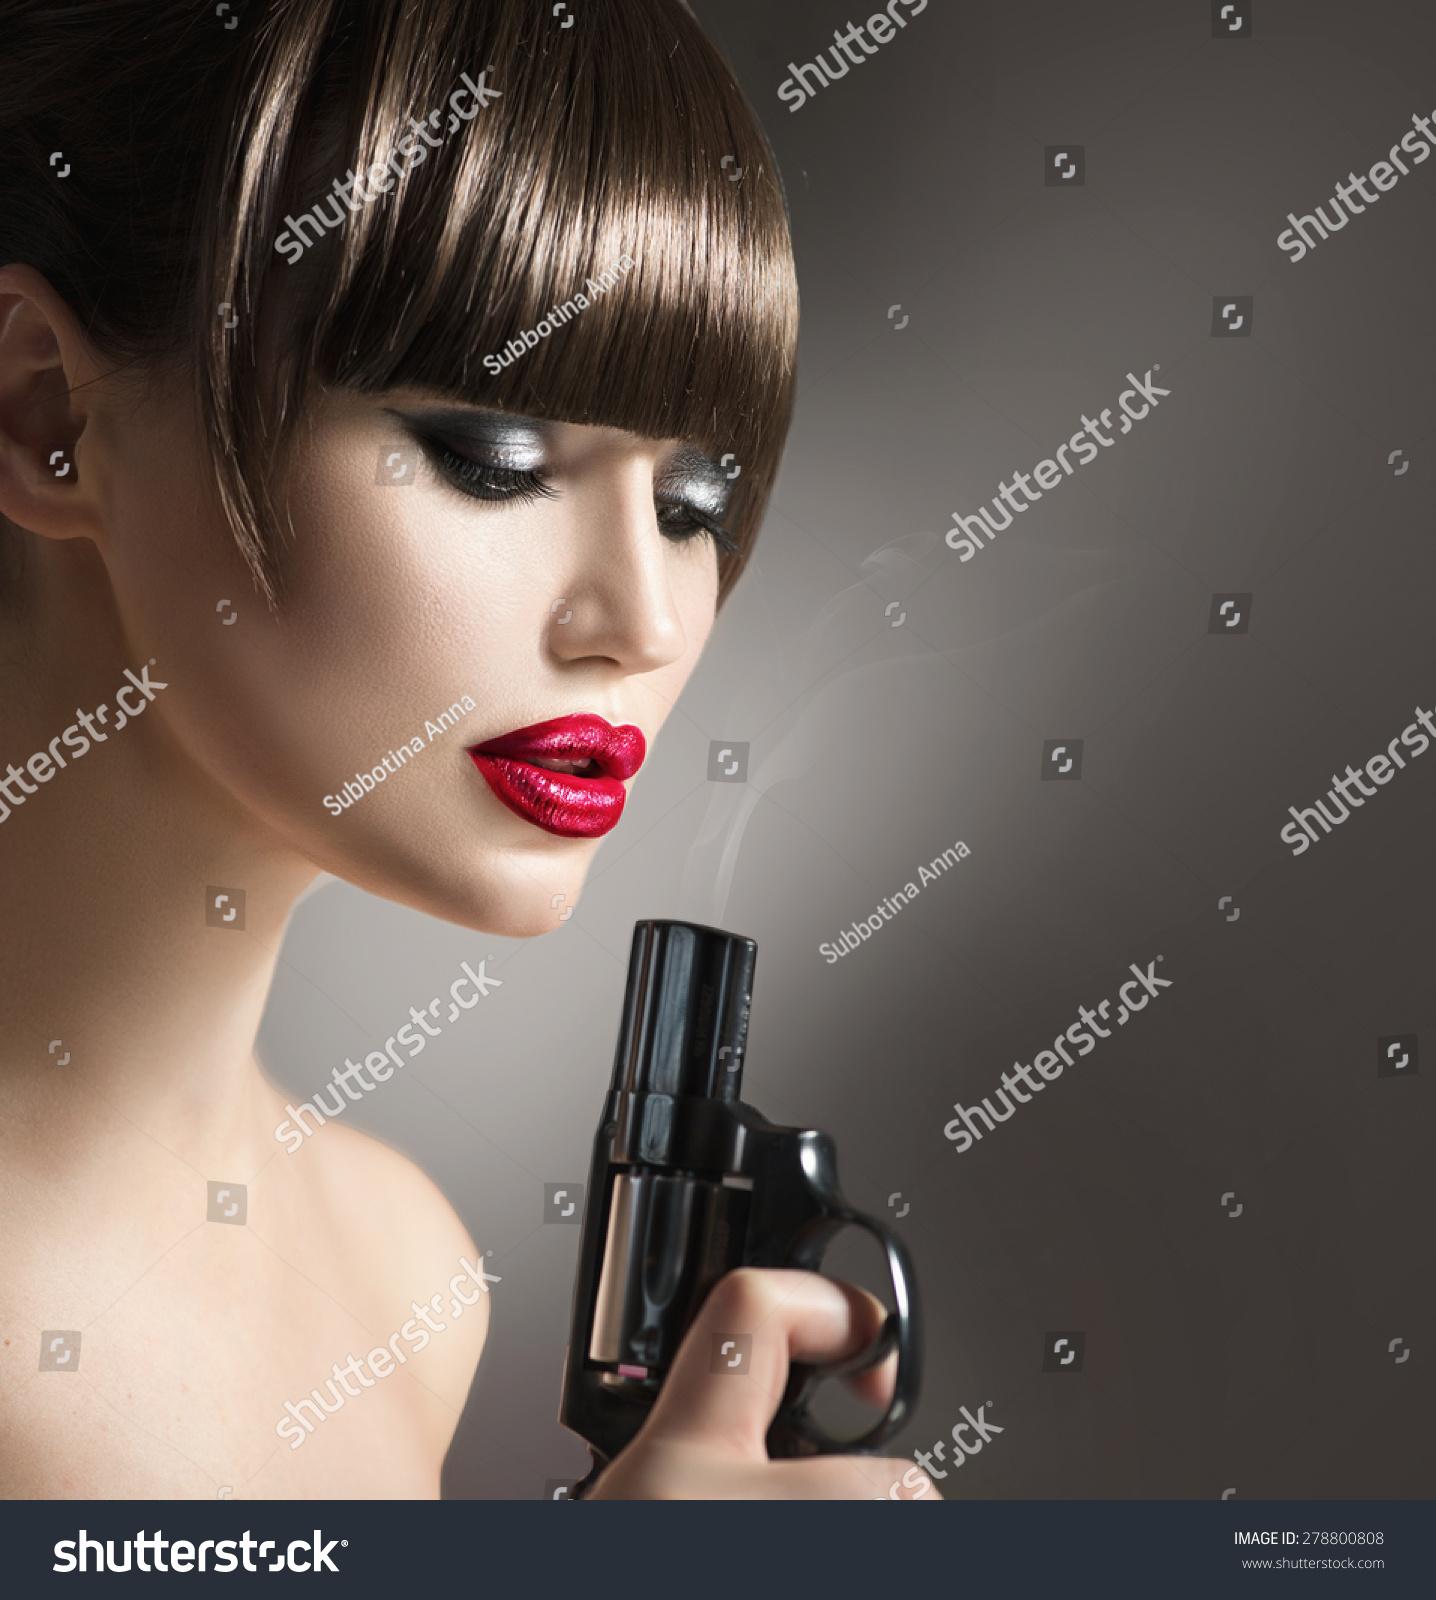 Sexy Model Woman Gun Beauty Girl Stock Photo & Image (Royalty-Free ...